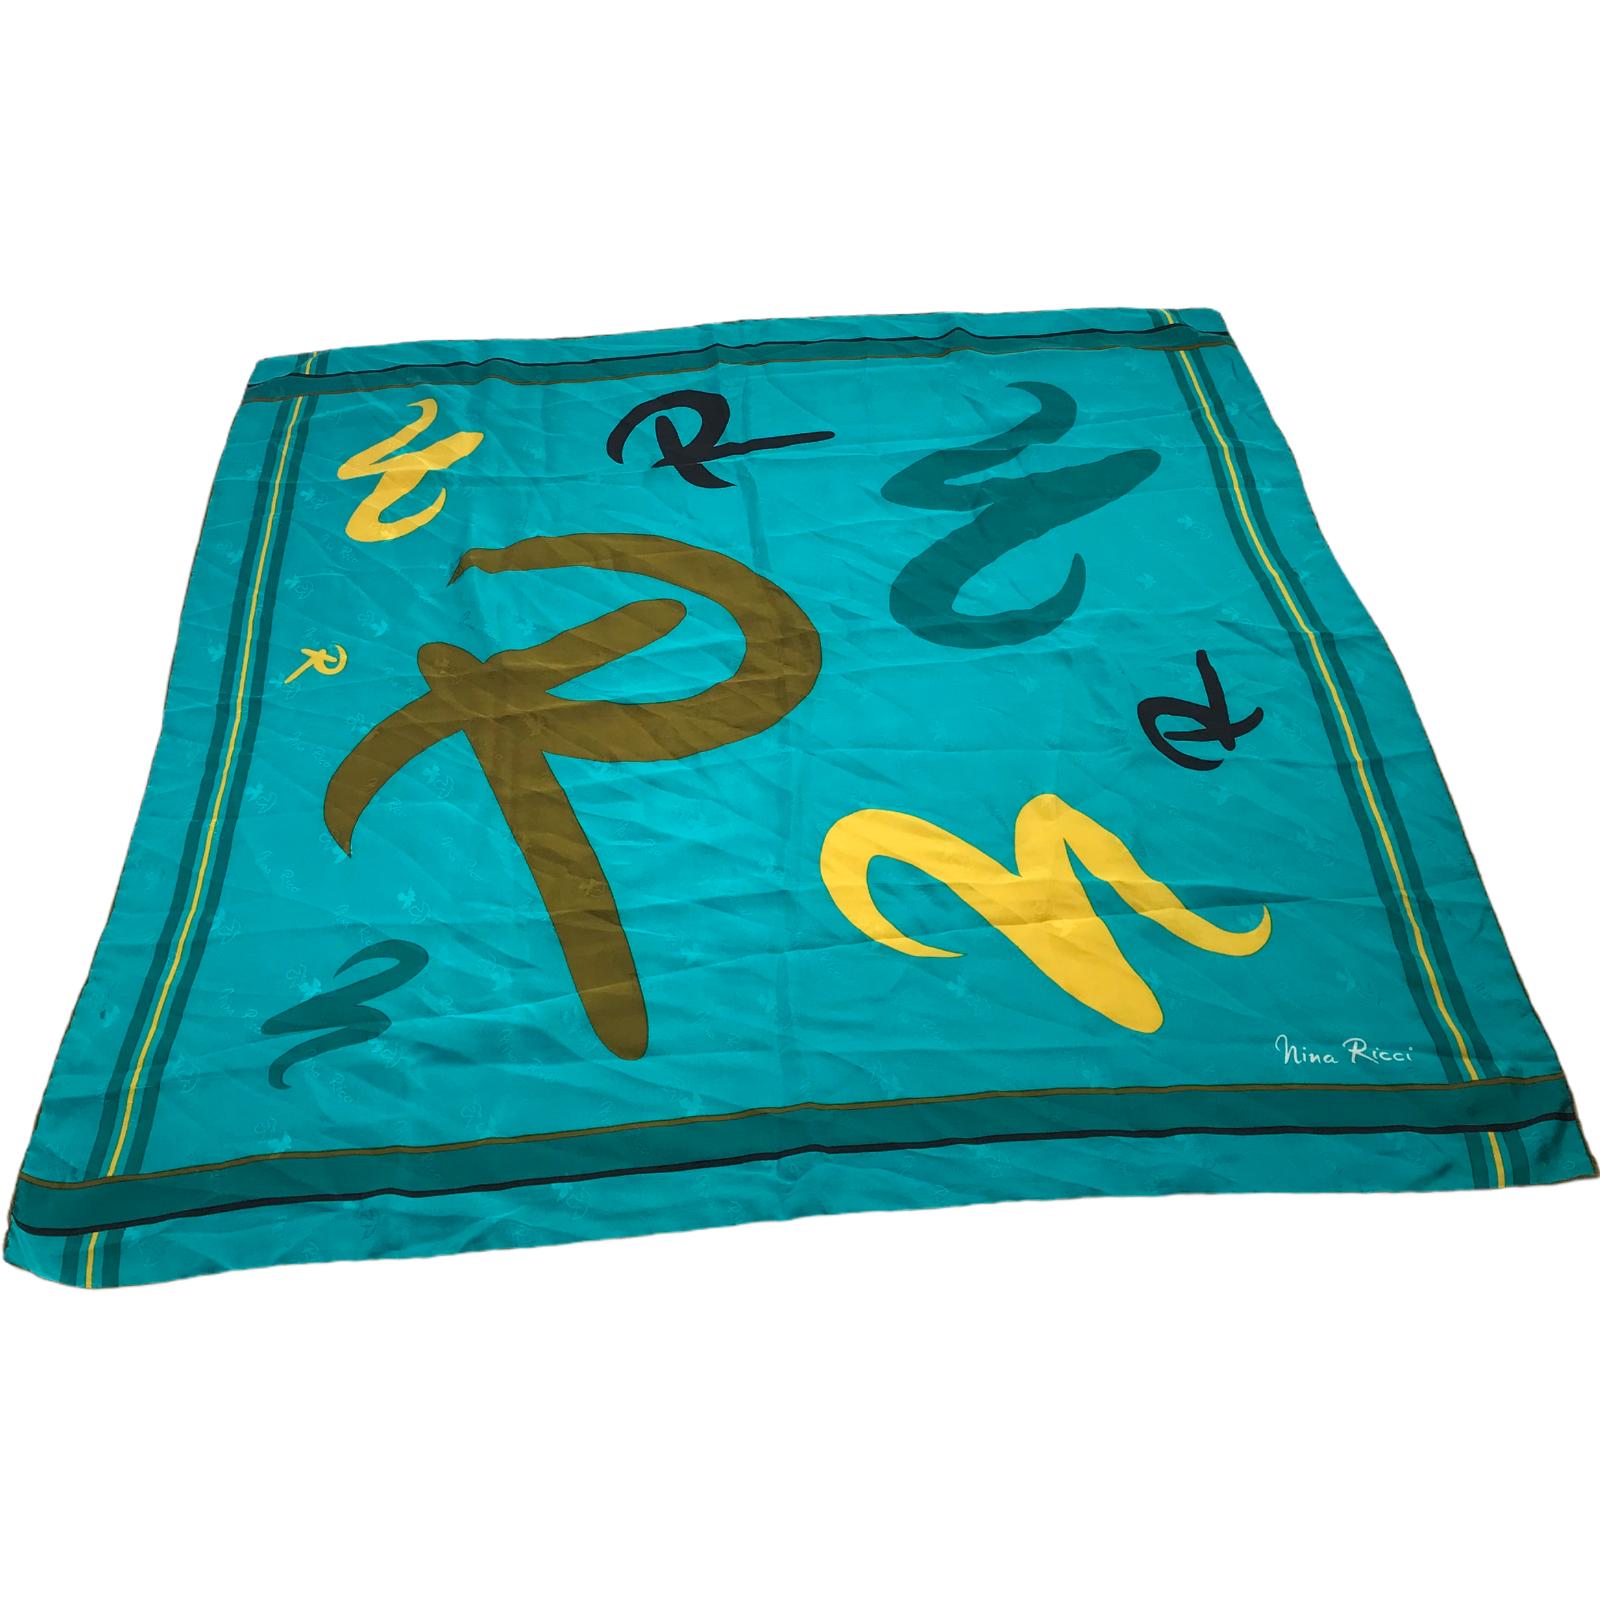 Authentic Vtg Nina Ricci Silk Designer Scarf Logo Monogram Hand Rolled 34